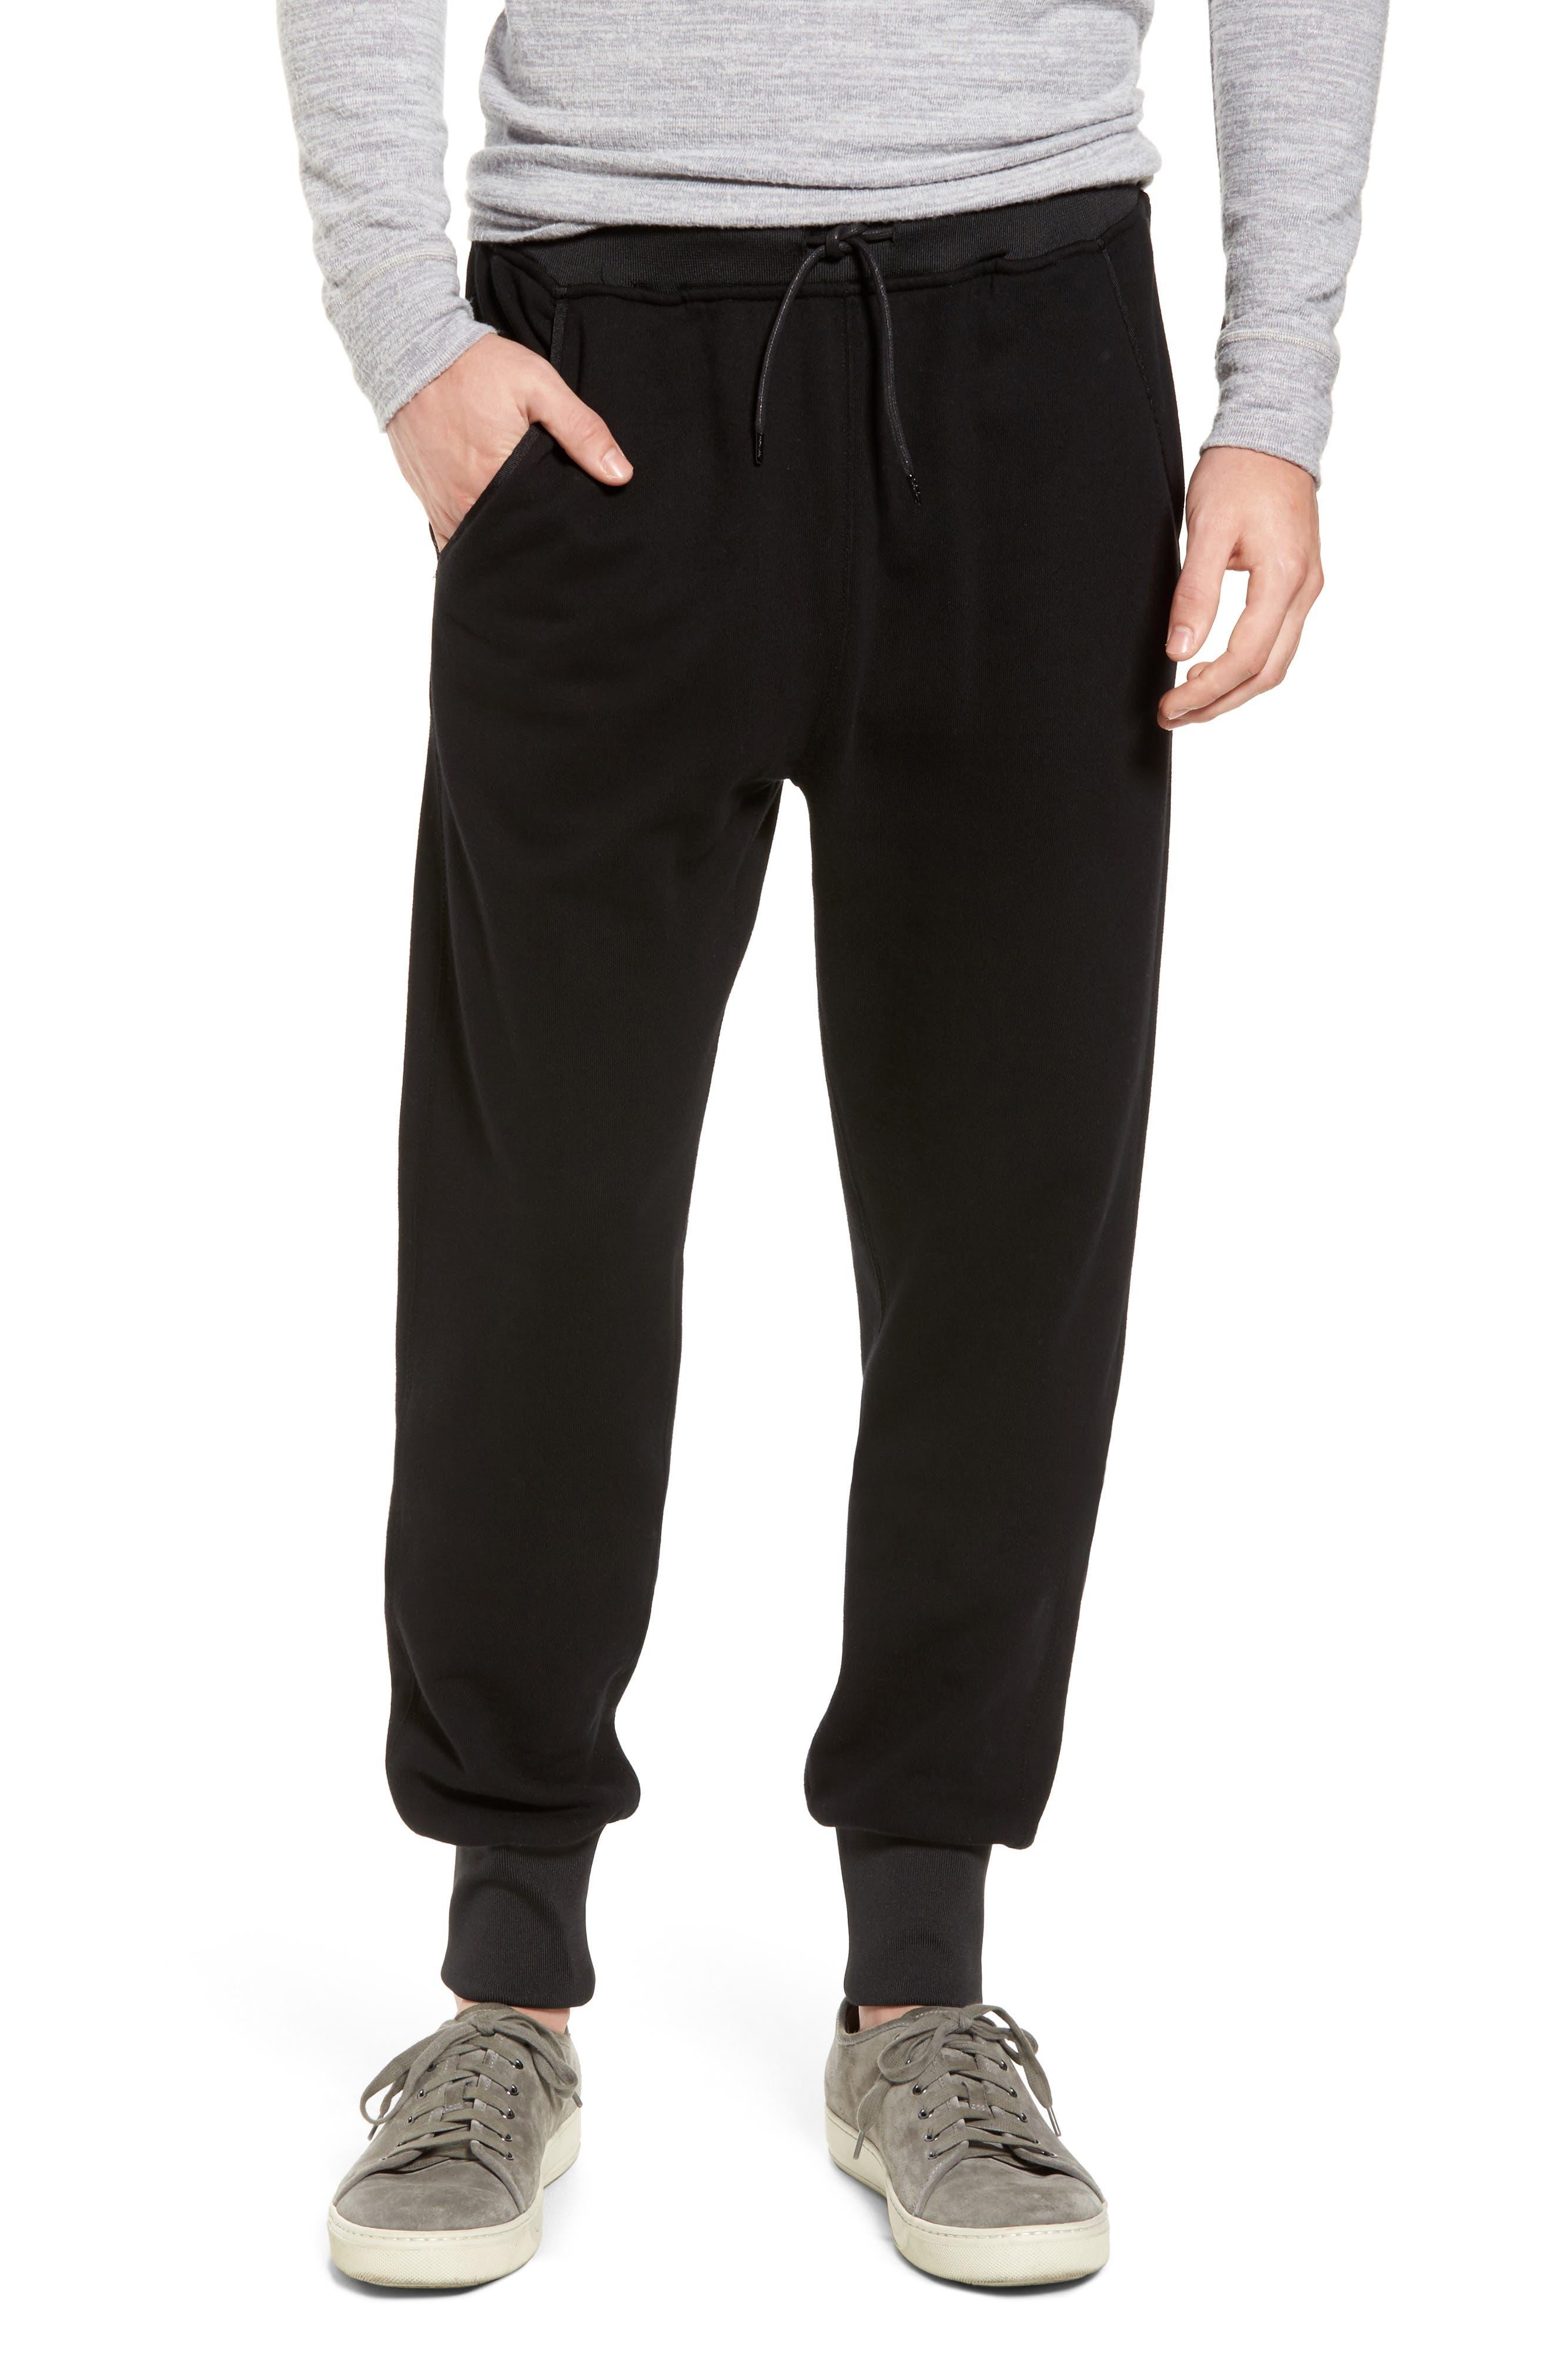 Club Nomade Sweatpants,                         Main,                         color, 002